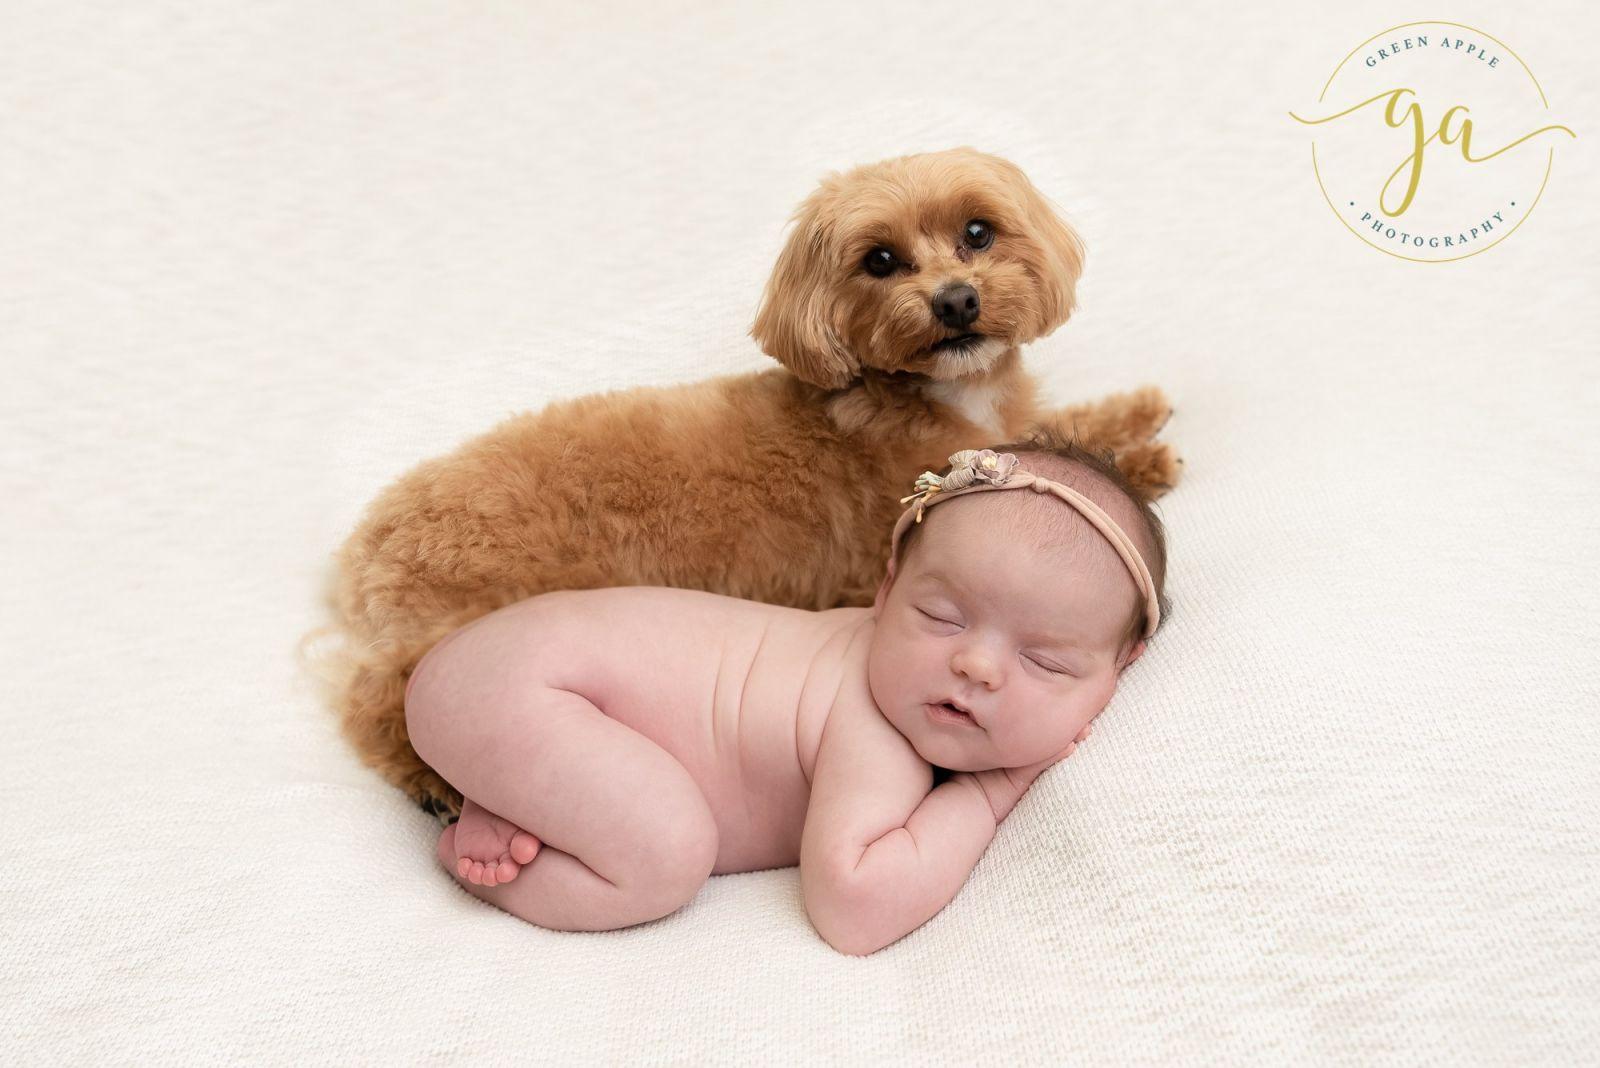 newborn photo with poodle dog